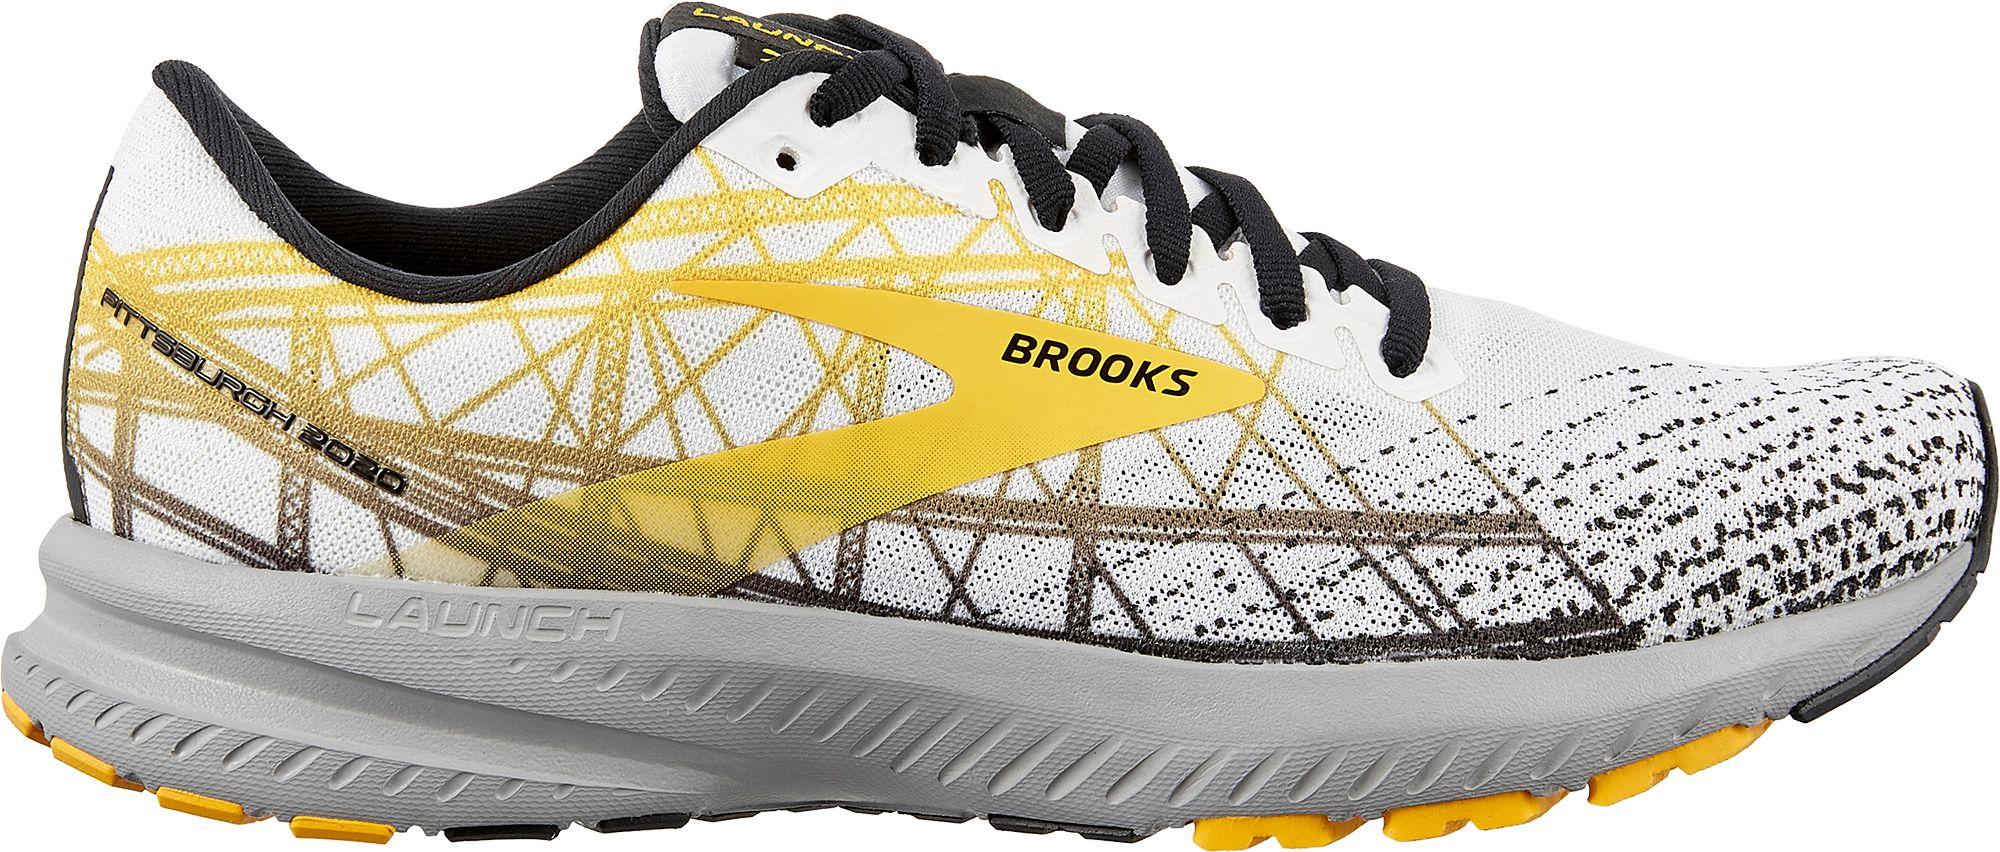 brooks marathon shoes